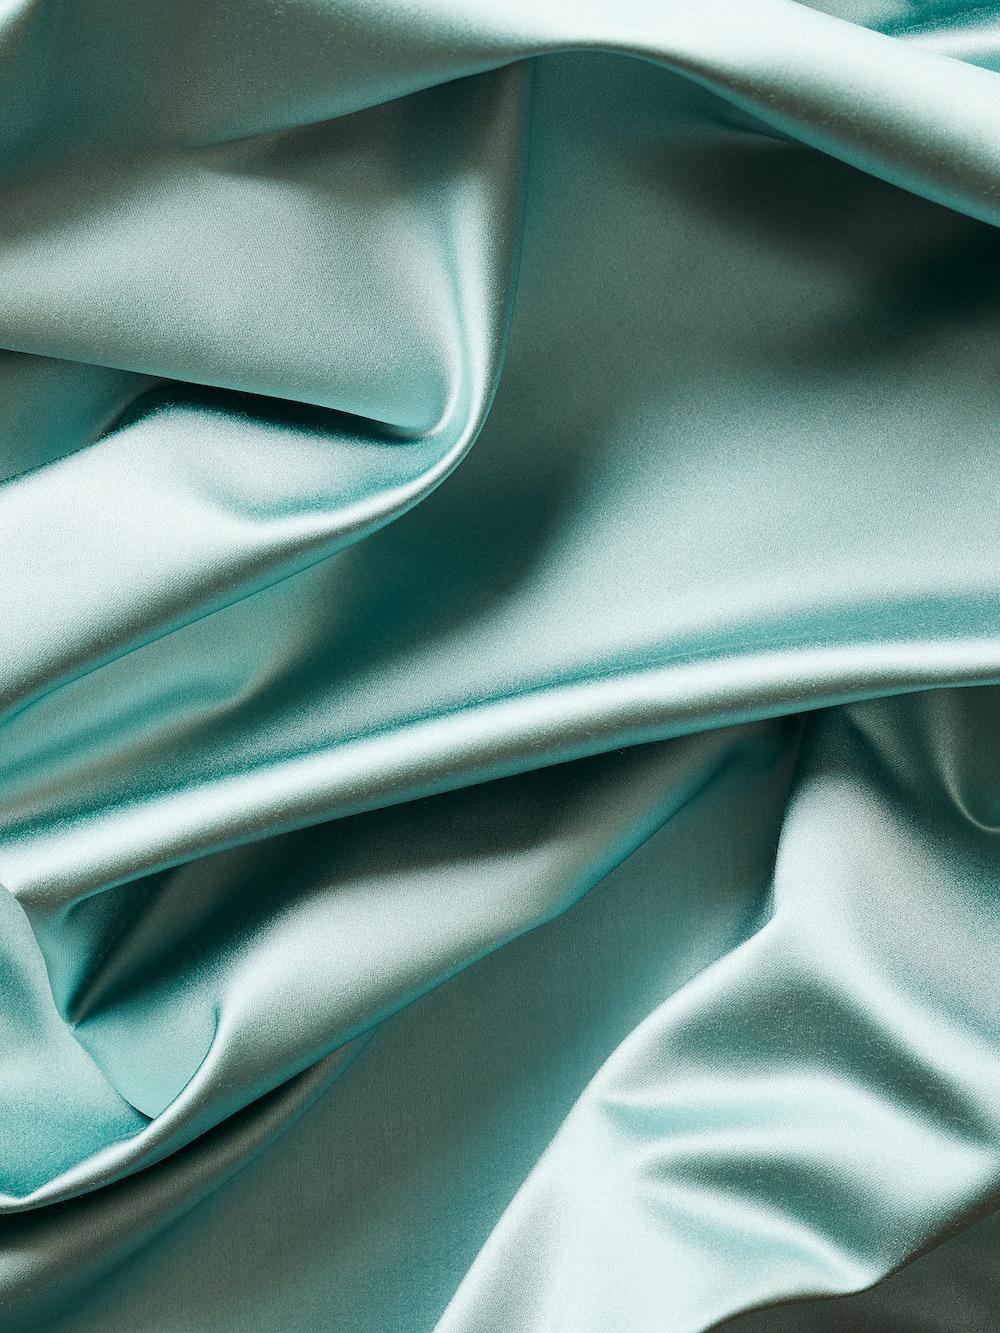 Tiber Fabric